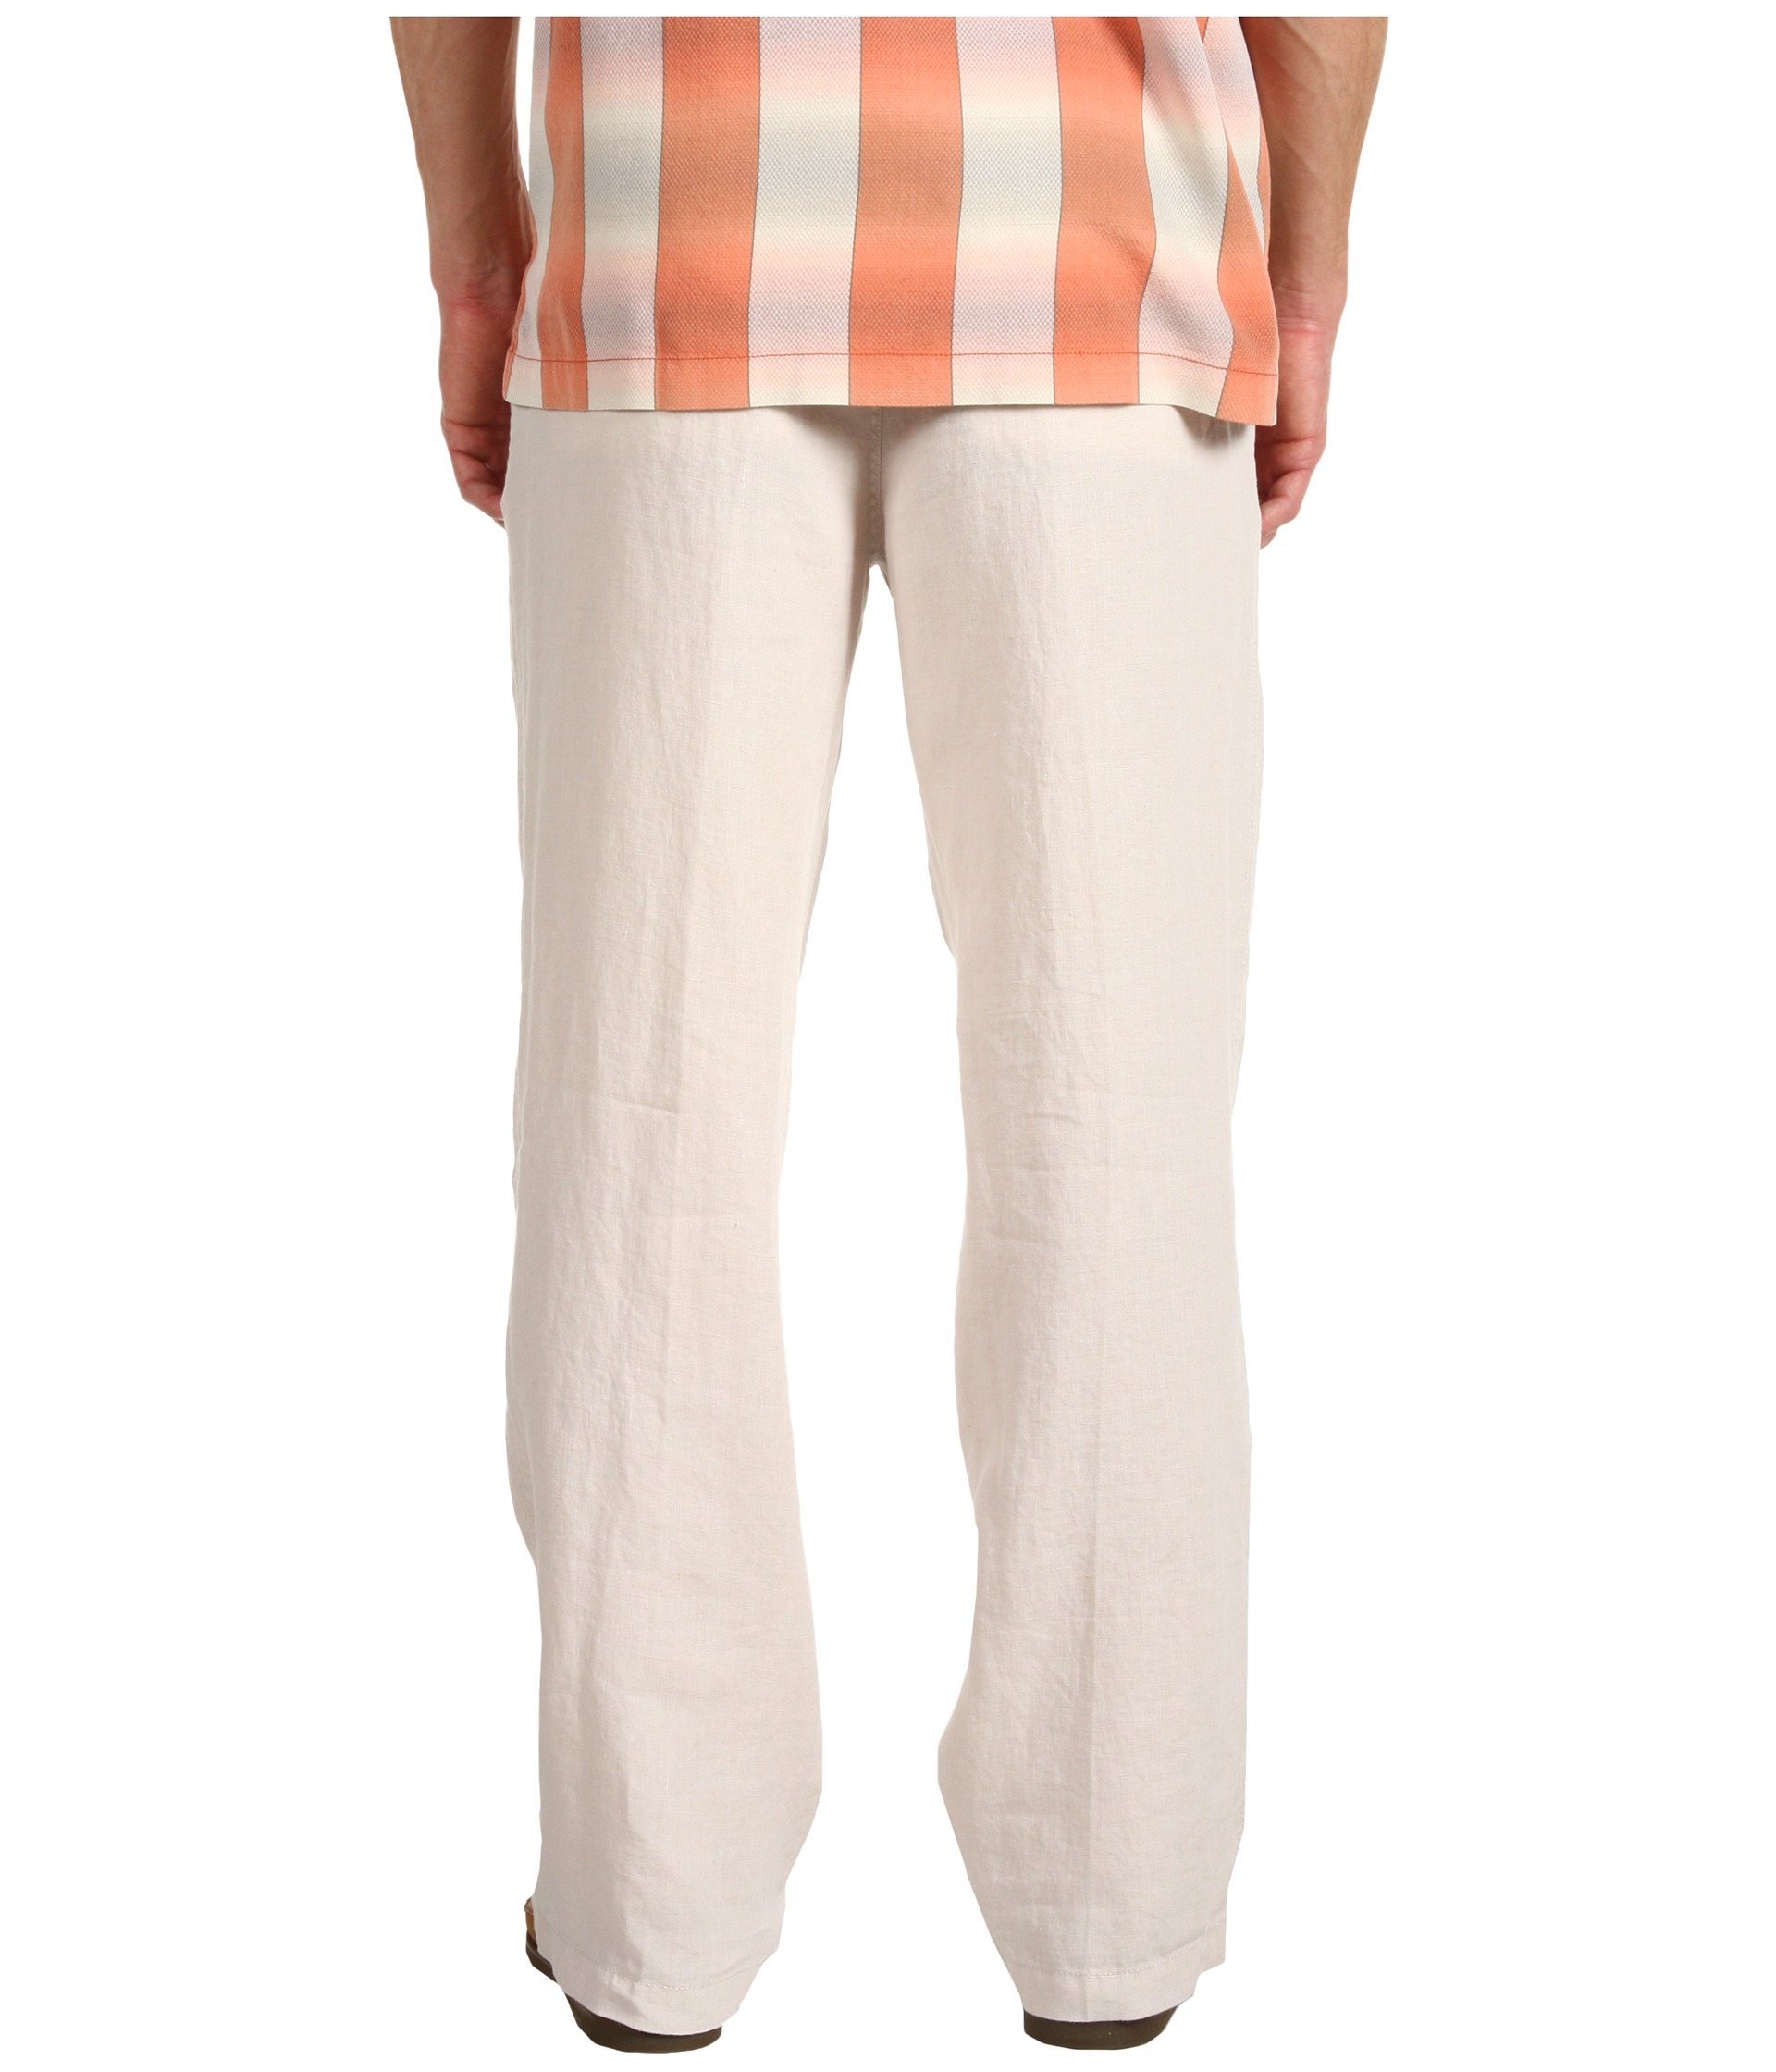 Lastest Linen Pants For Women  Seal Relaxed Linen Pants  Island Company